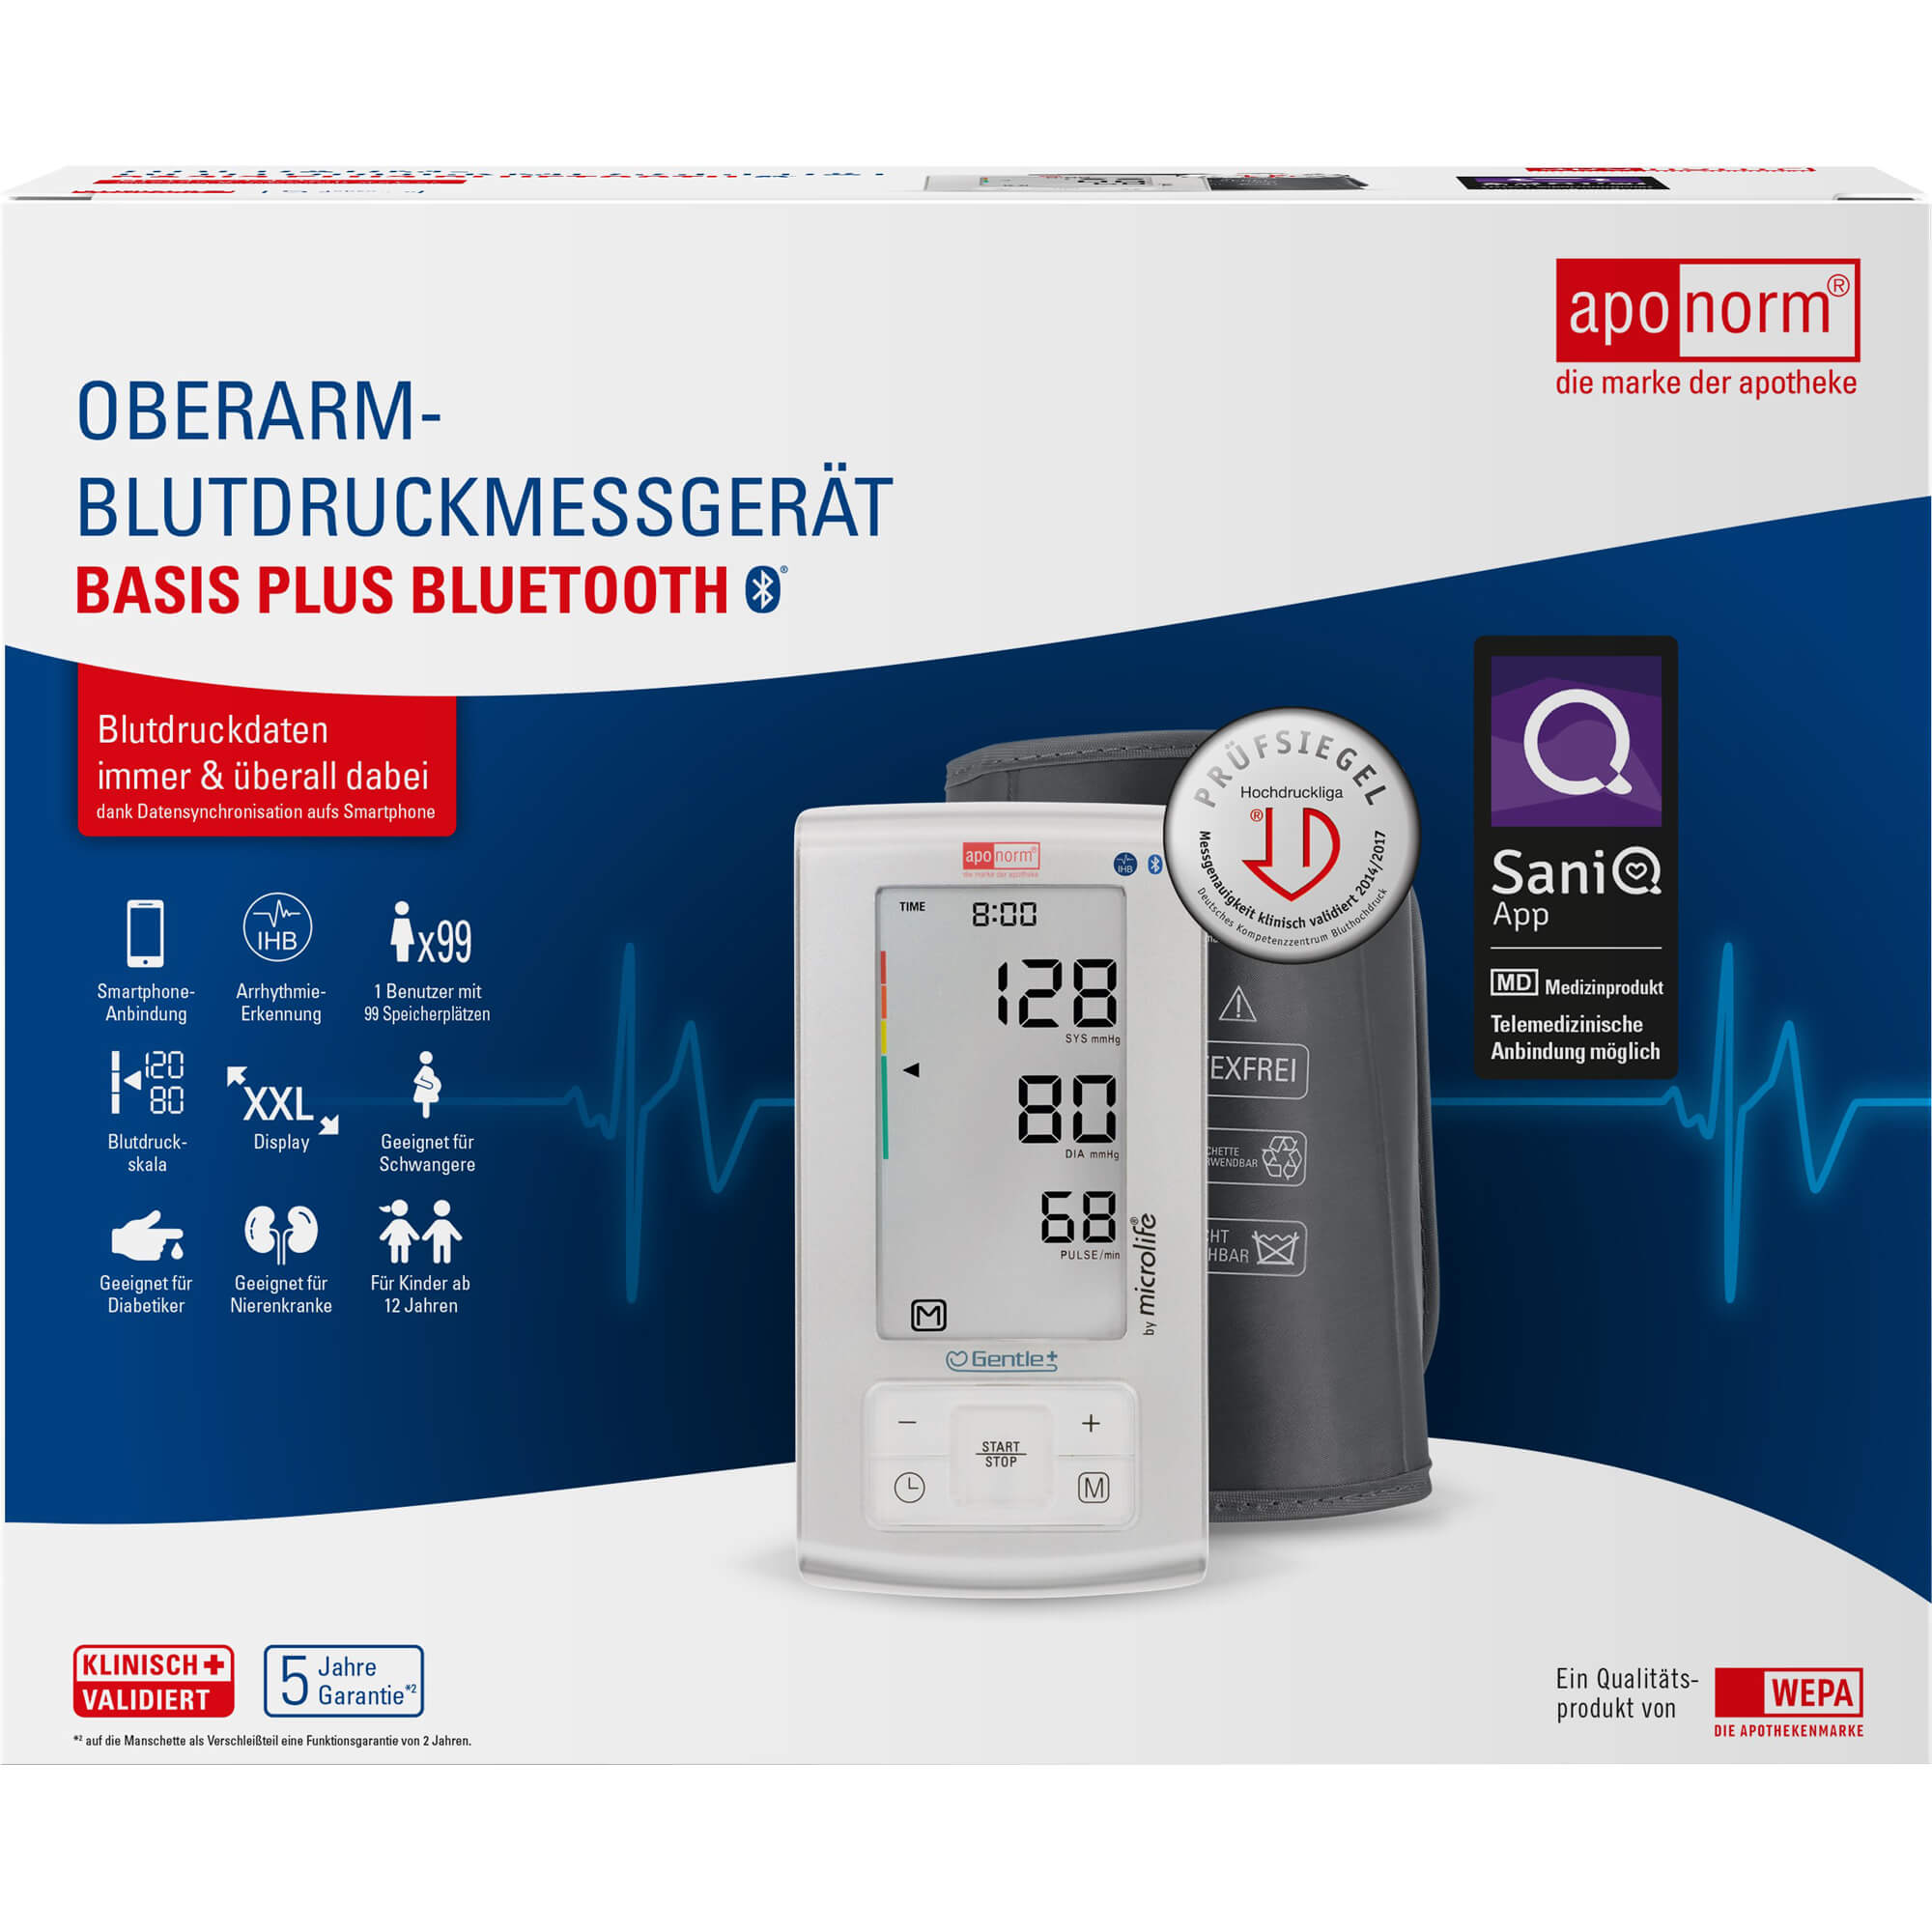 Aponorm-Blutdruckmessgeraet-Basis-Plus-Oberarm-Bluetooth